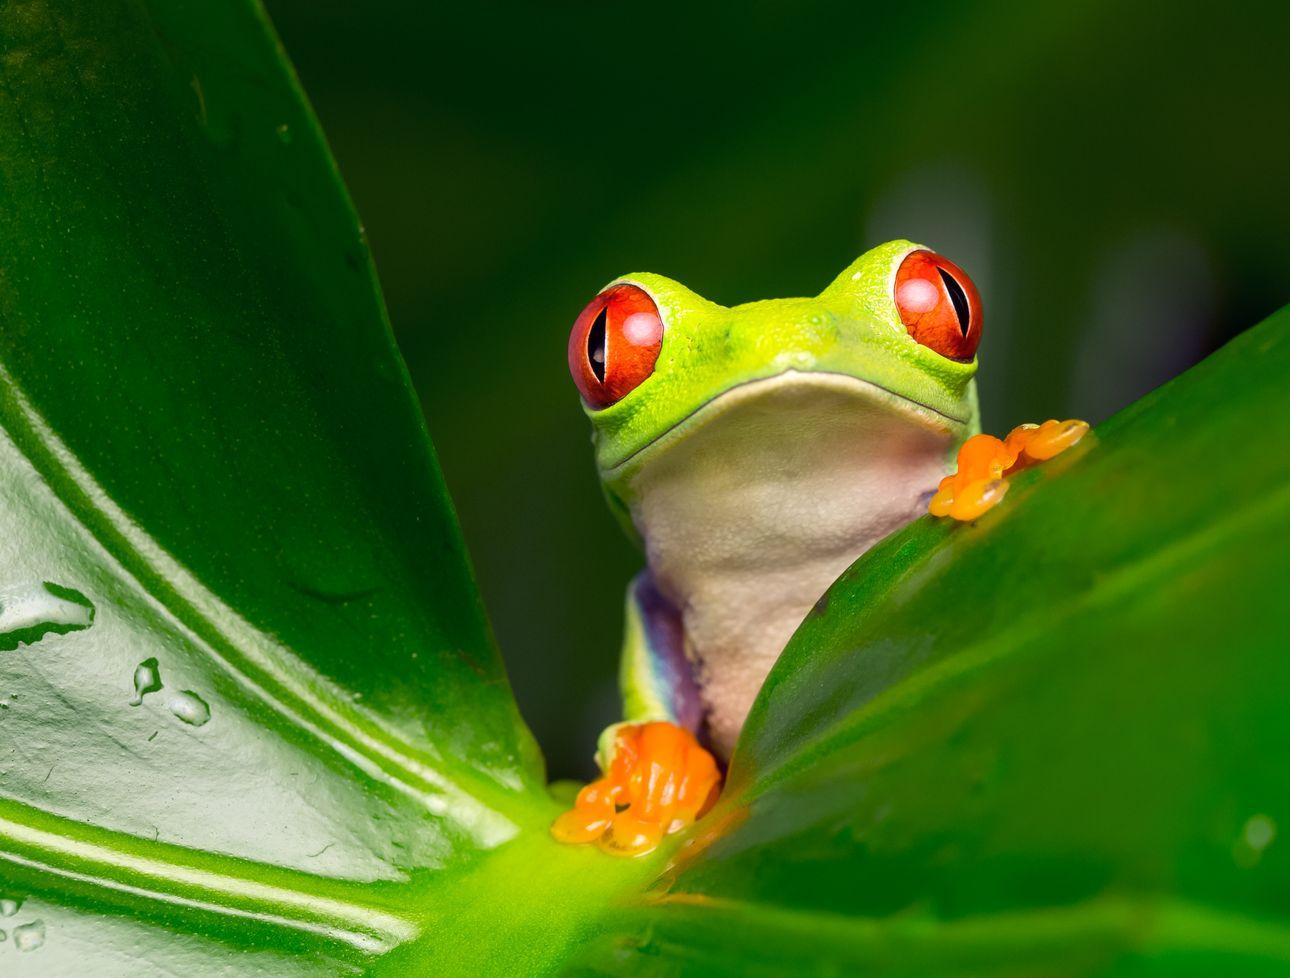 Kipp-Prozesse: Größerer Teil des Amazonas-Regenwaldes bedroht